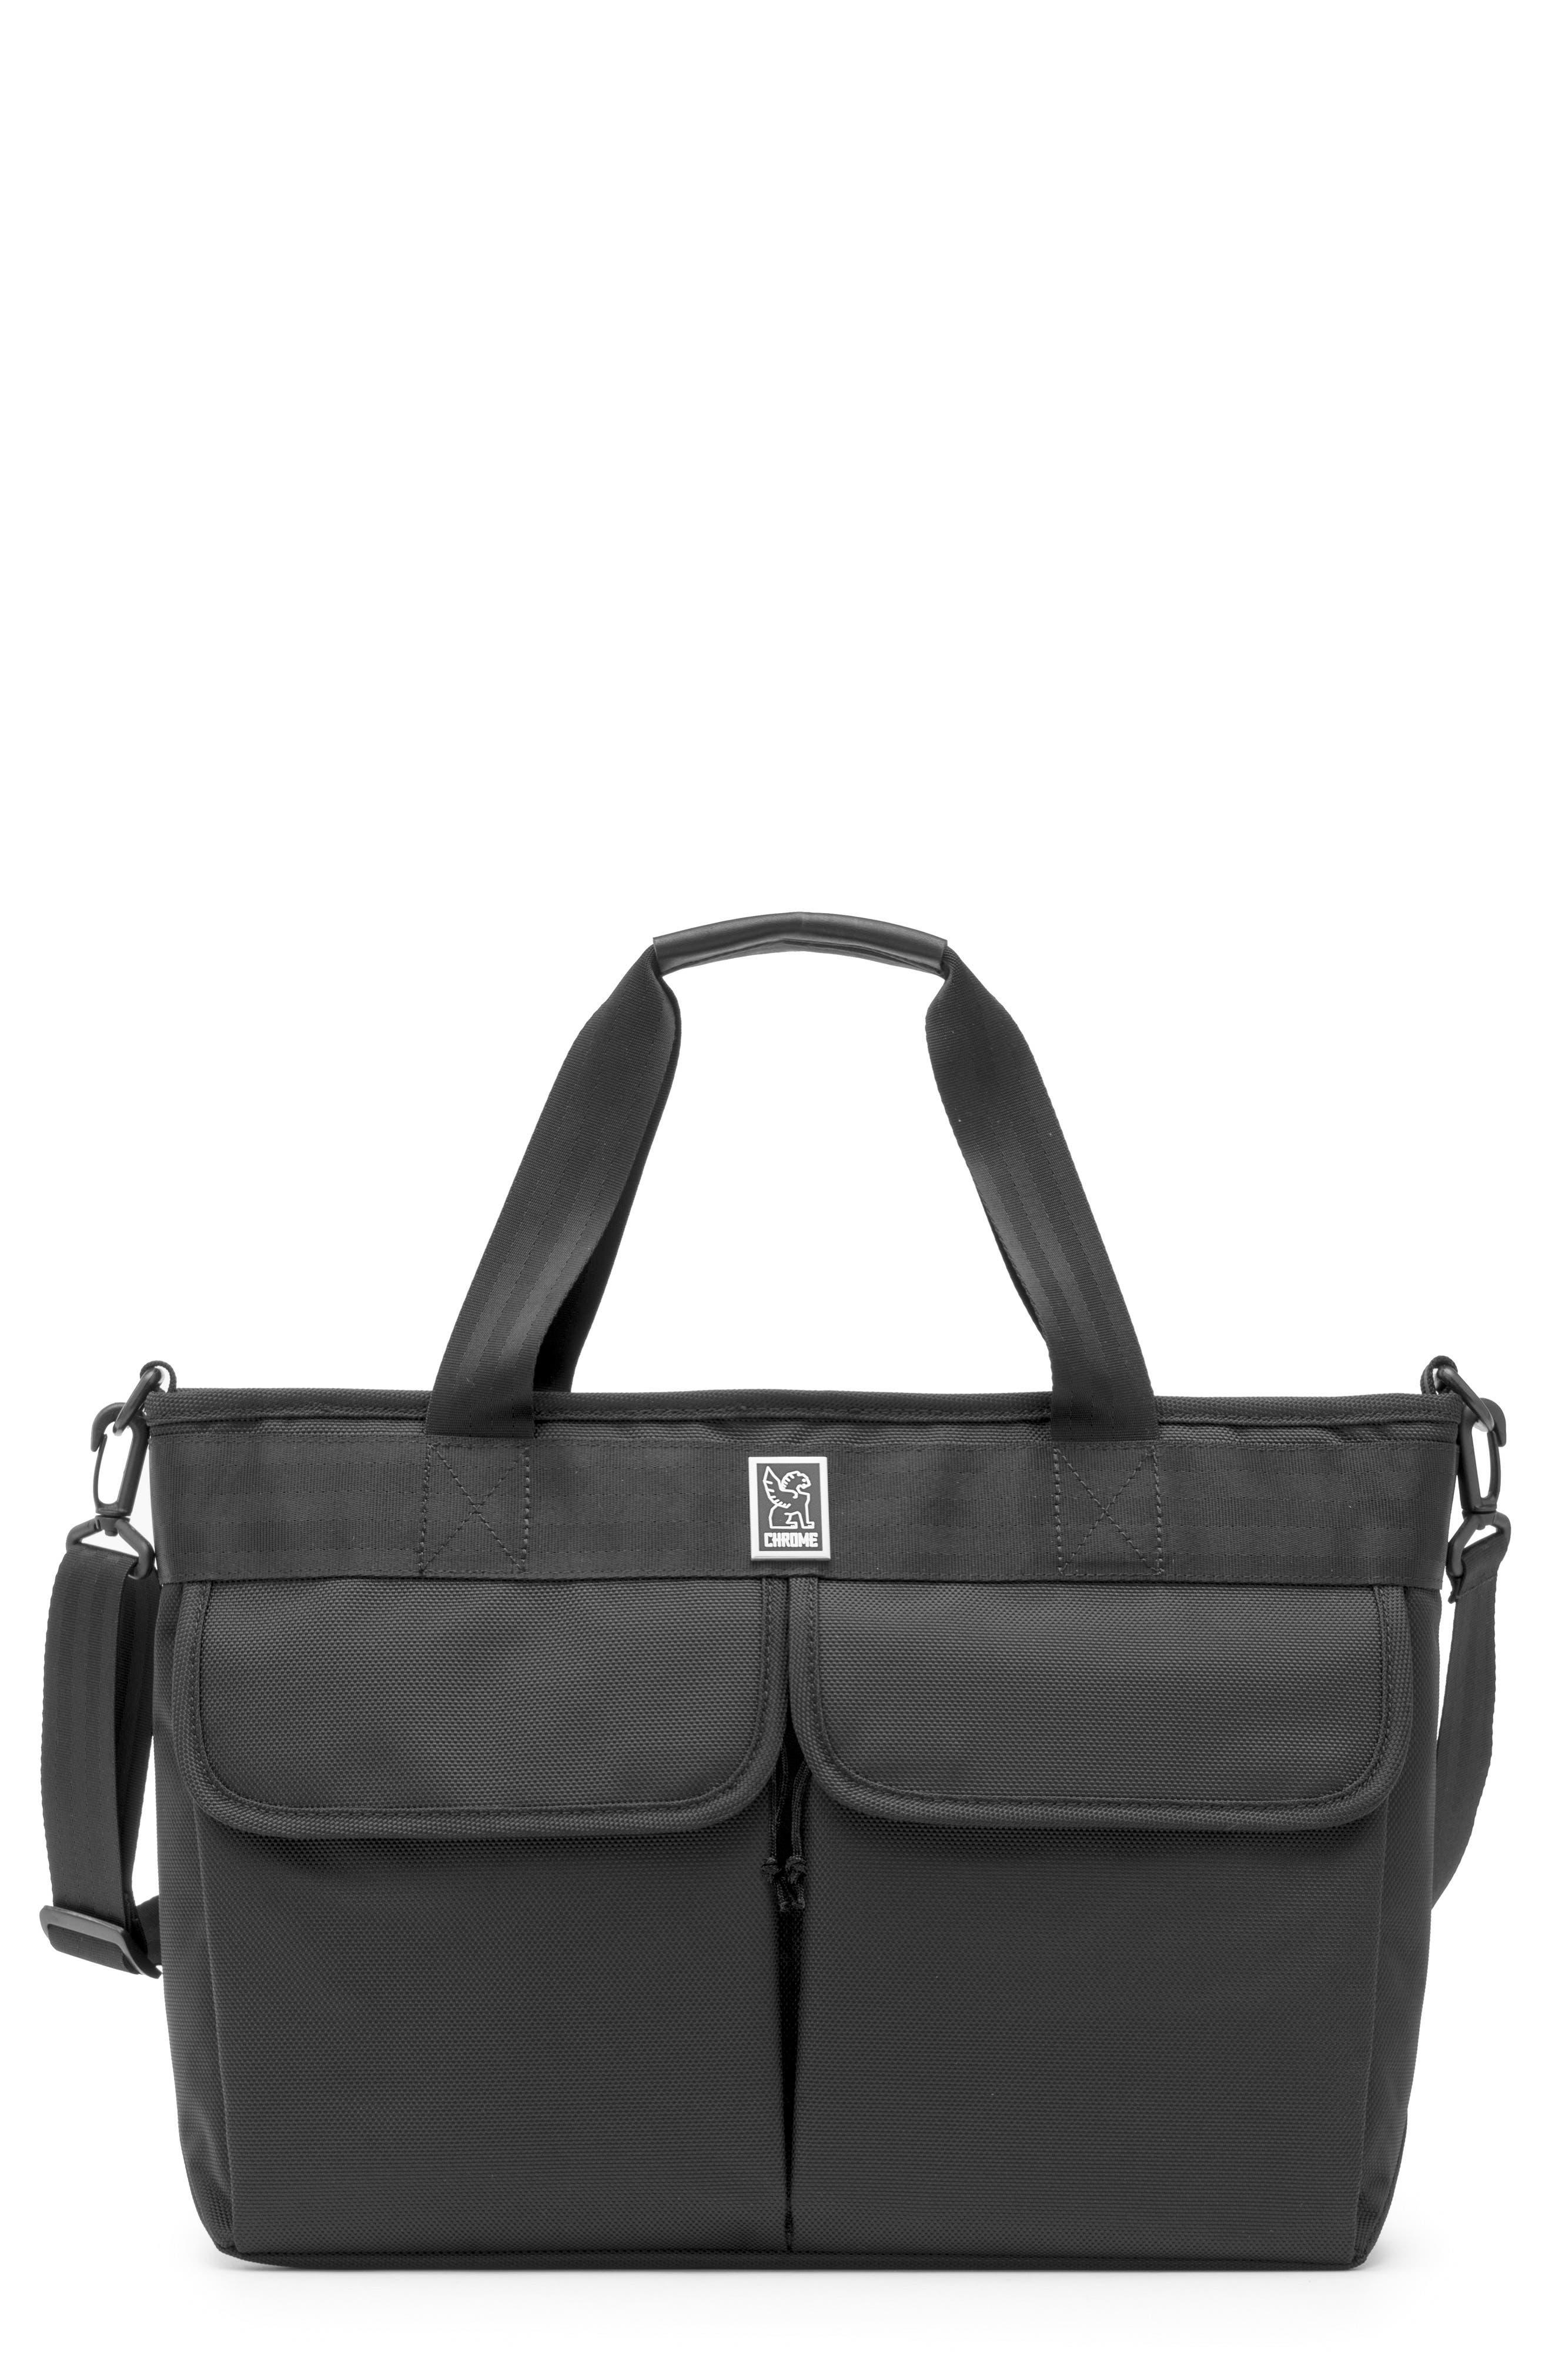 Chrome Juno Travel Tote Bag